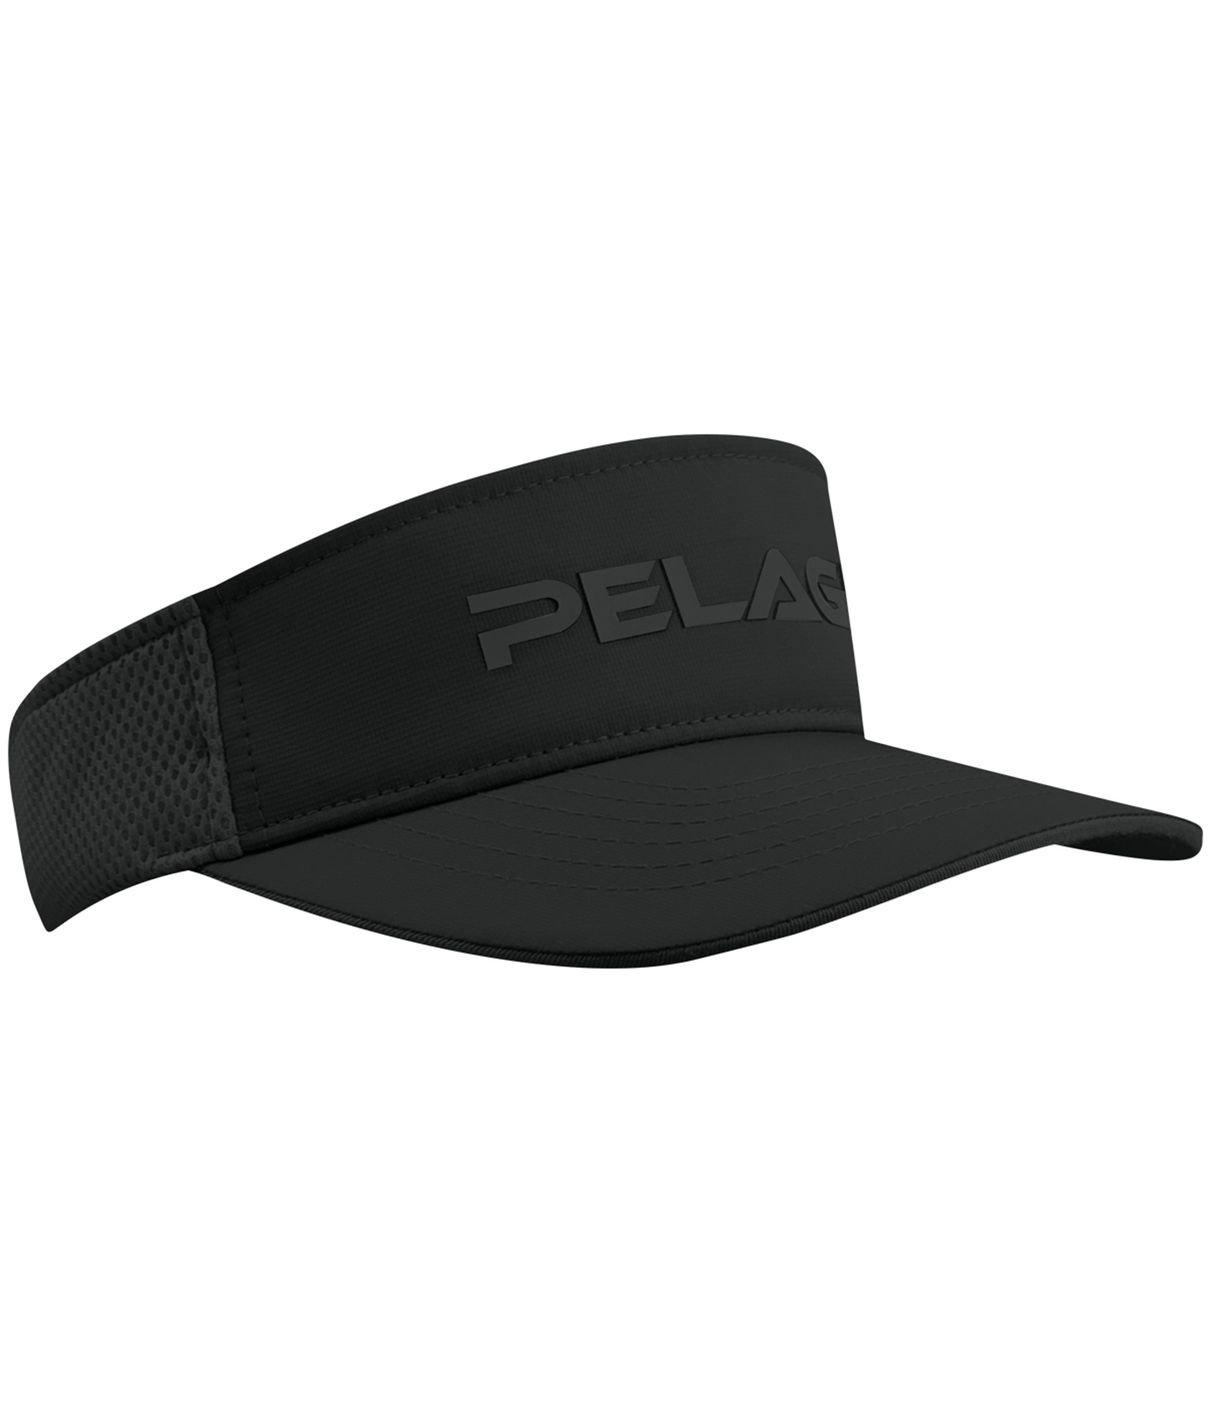 PELAGIC Flexfit Pro Fishing Visor Black by PELAGIC